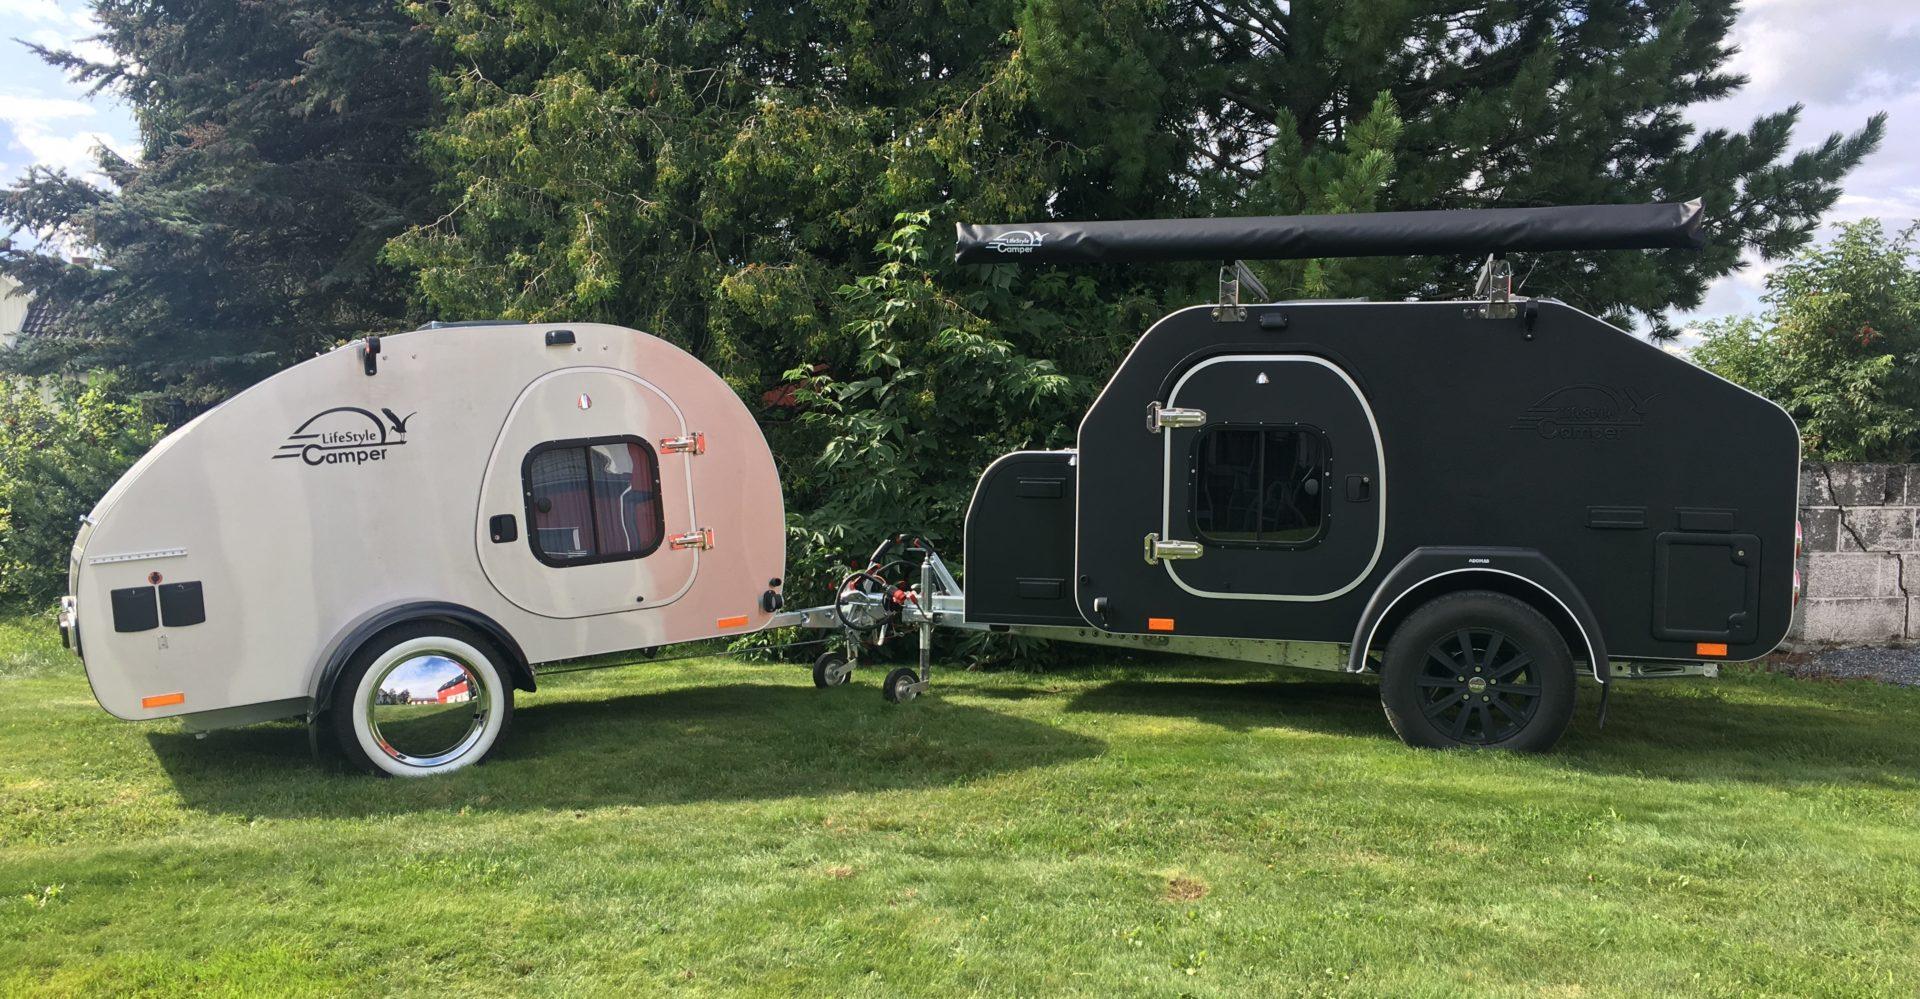 lifestyle camper norge as forhandler